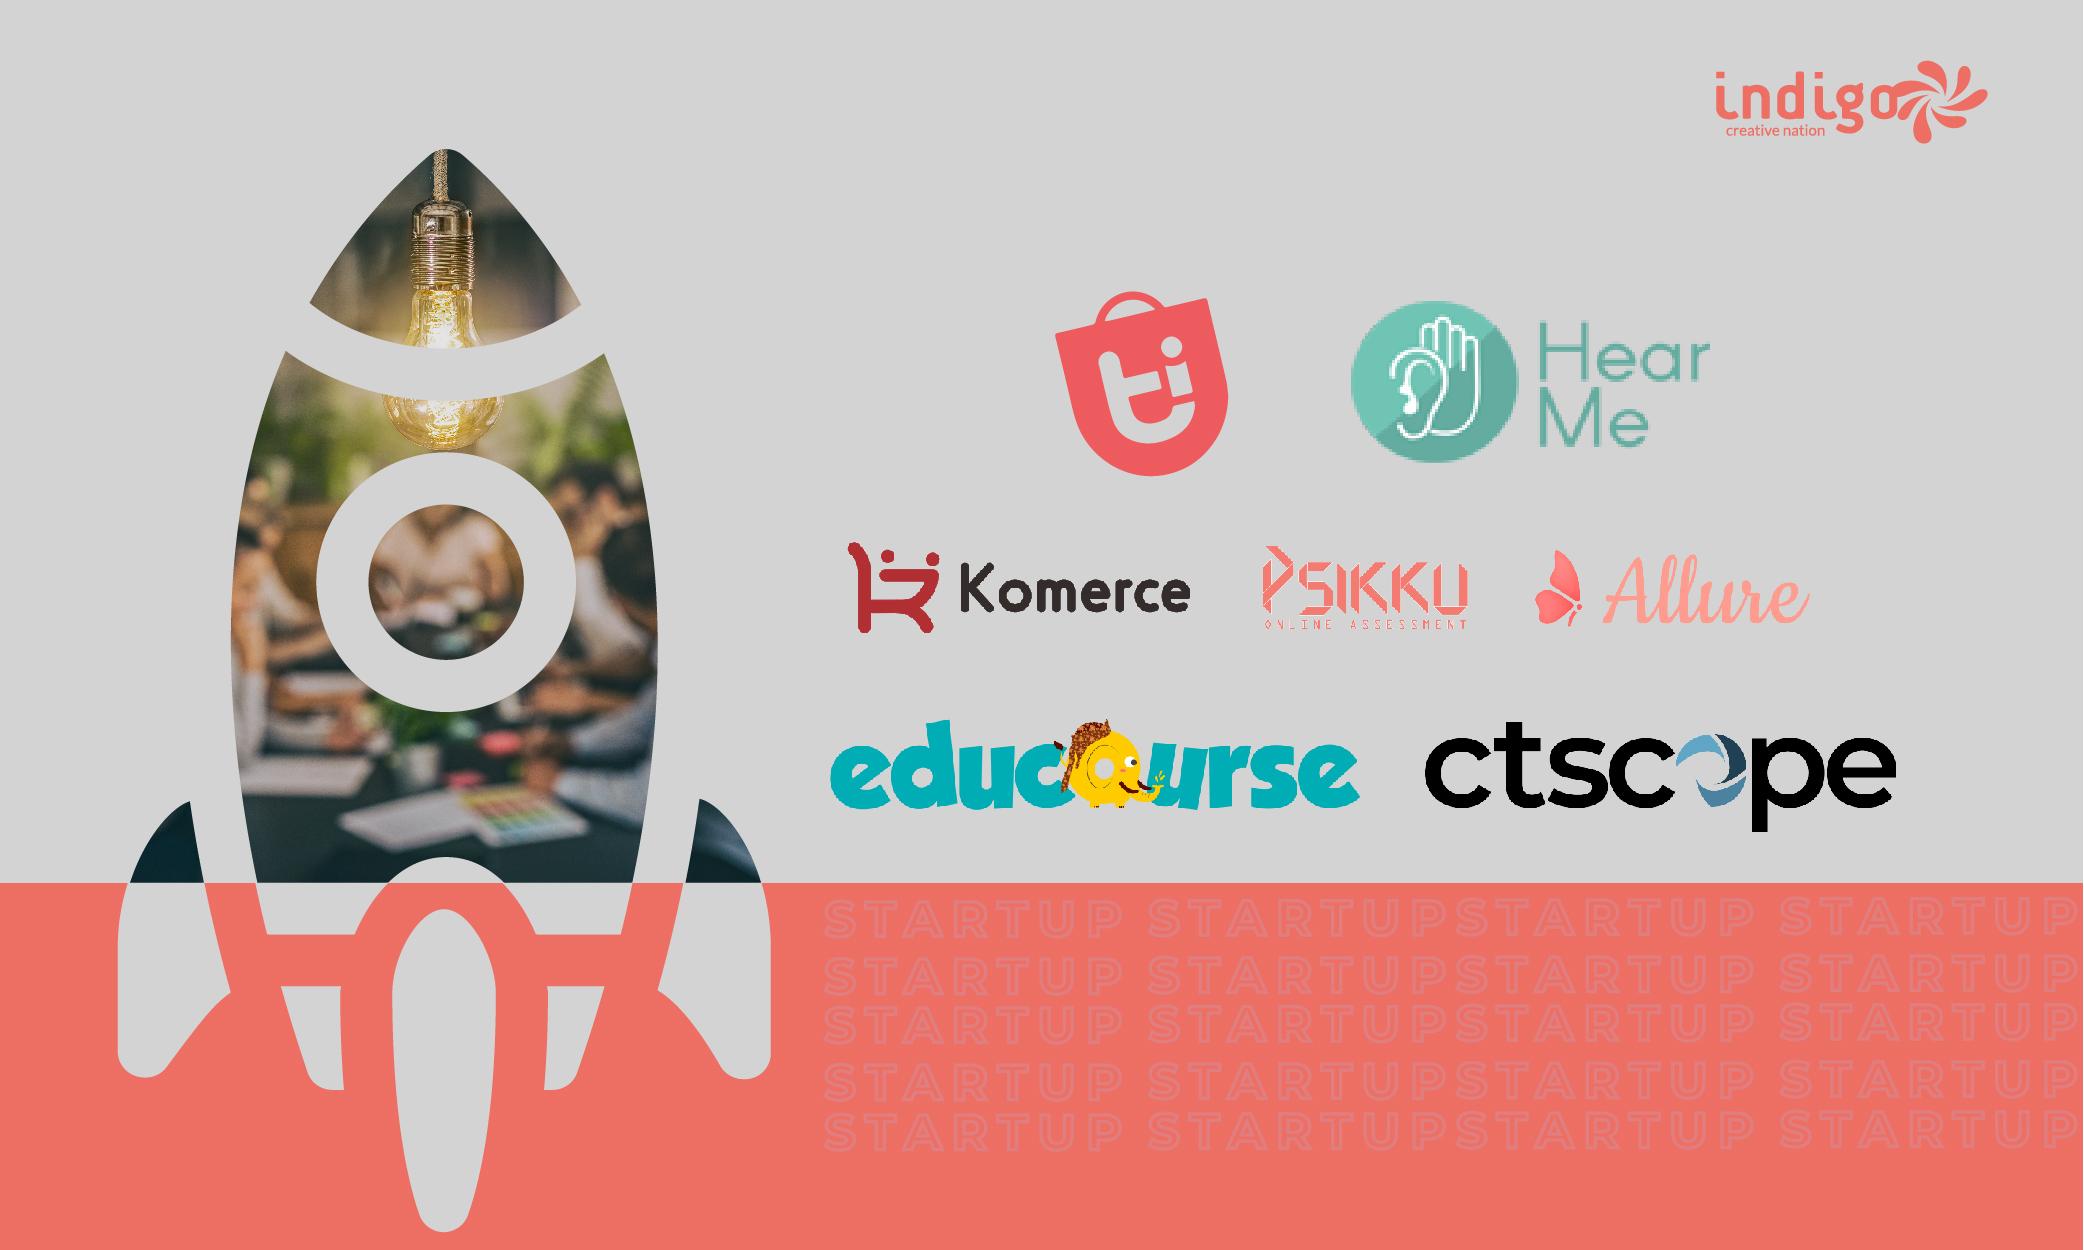 Telkom Tetapkan 7 Startup Indigo Batch 1